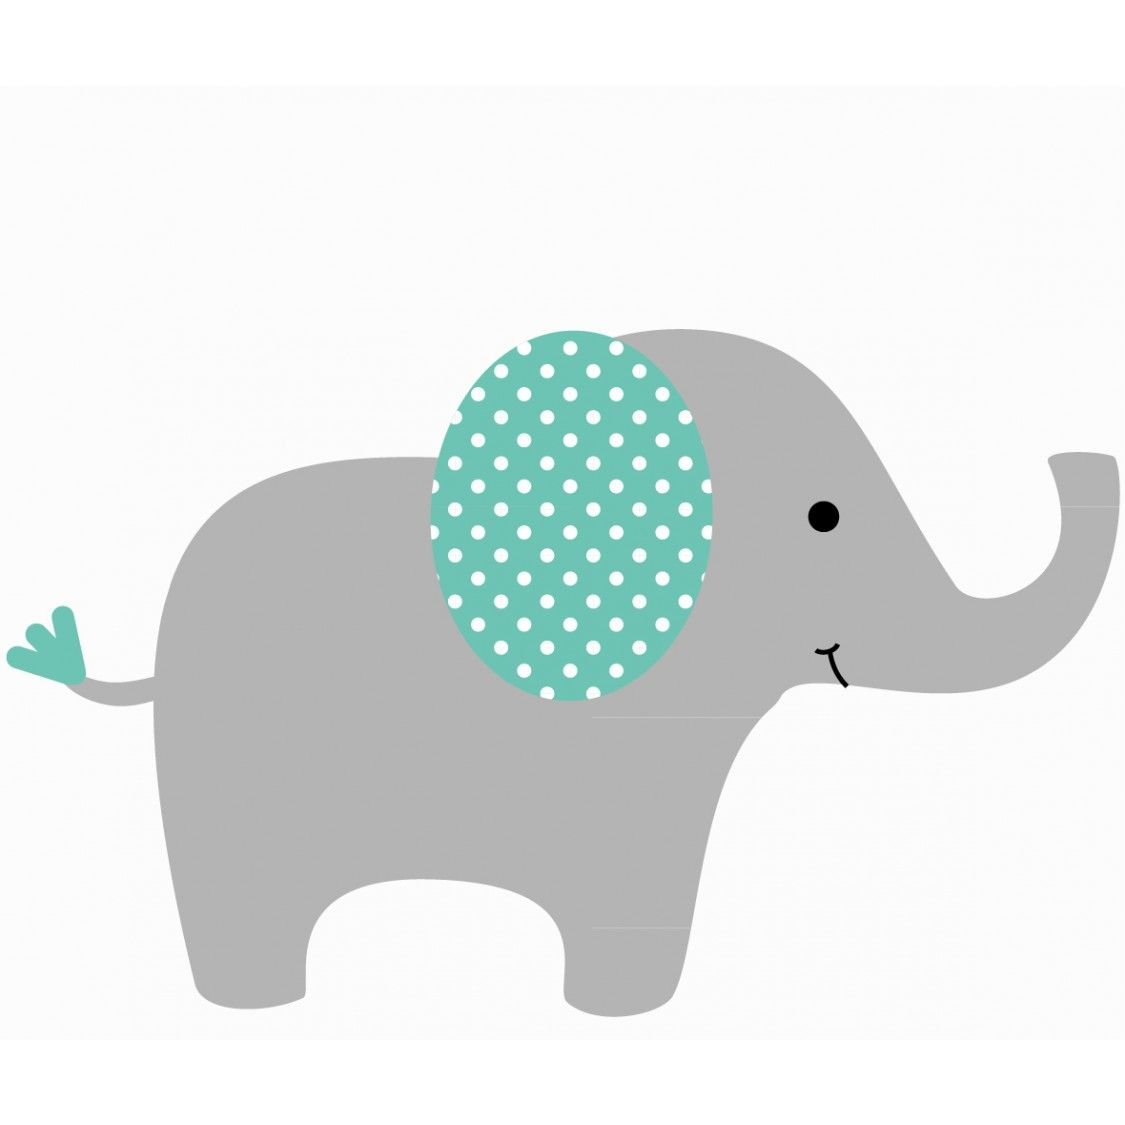 Chevron clipart elephant, Picture #348889 chevron clipart.